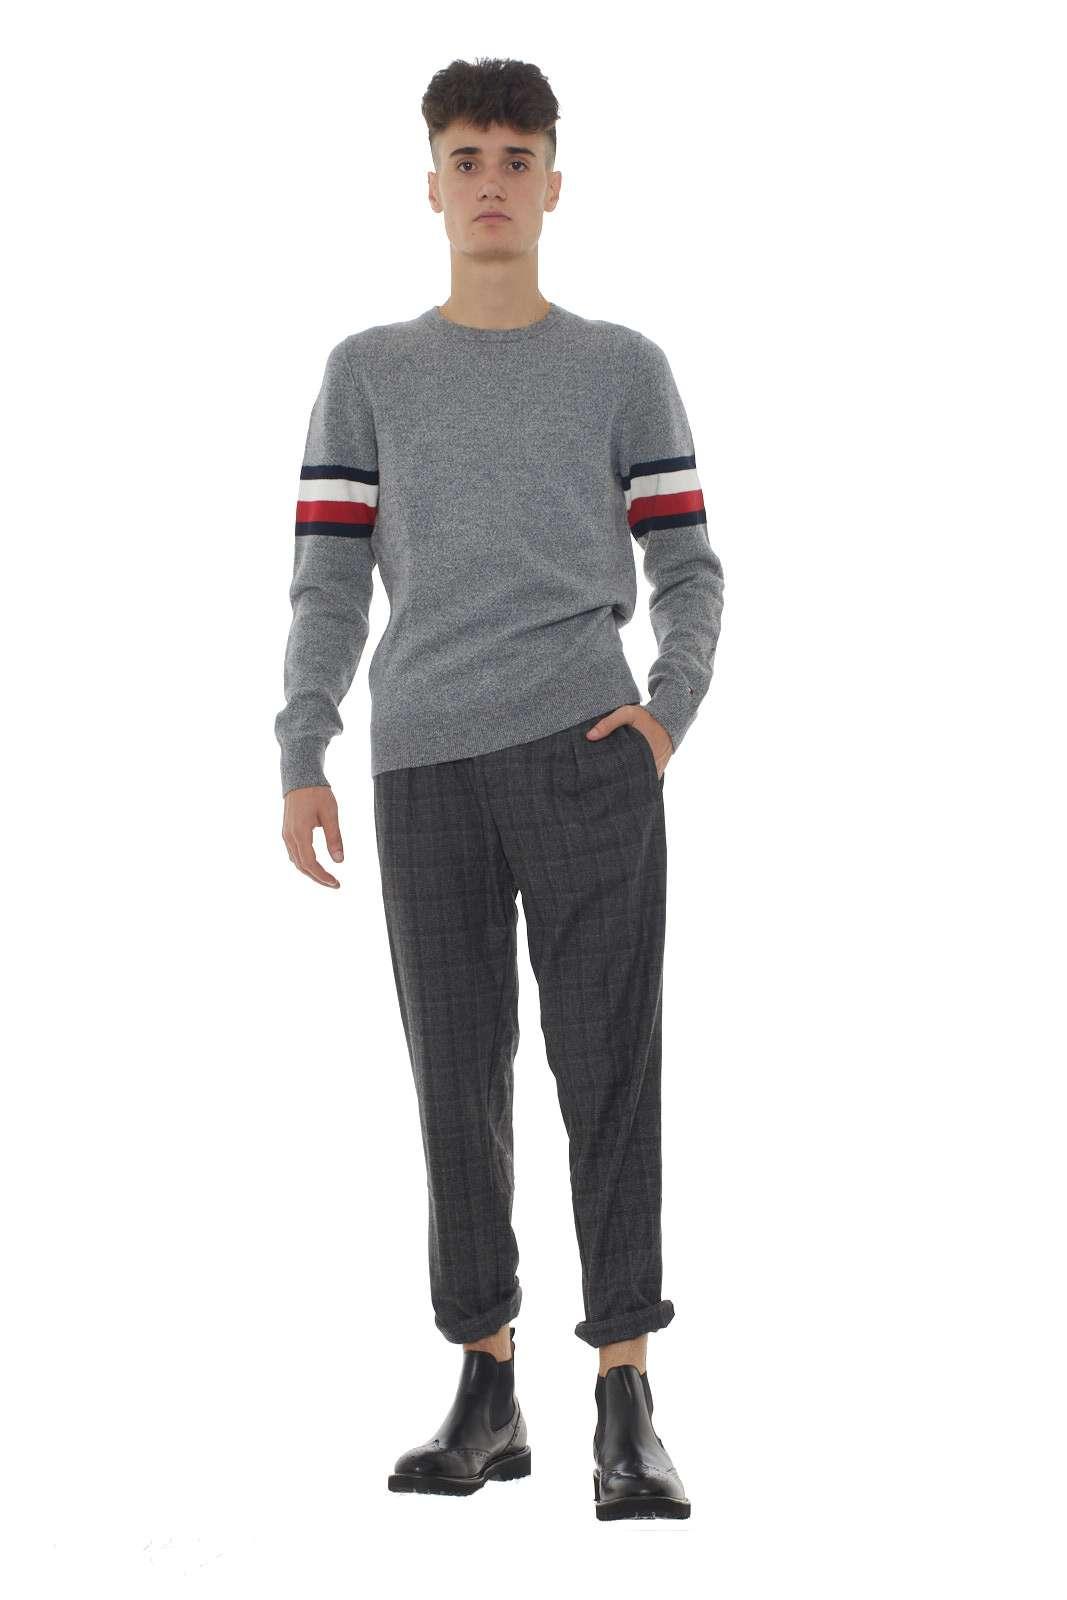 https://www.parmax.com/media/catalog/product/a/i/AI-outlet_parmax-pantaloni-uomo-Micheal%20Coal-carl3305-A.jpg